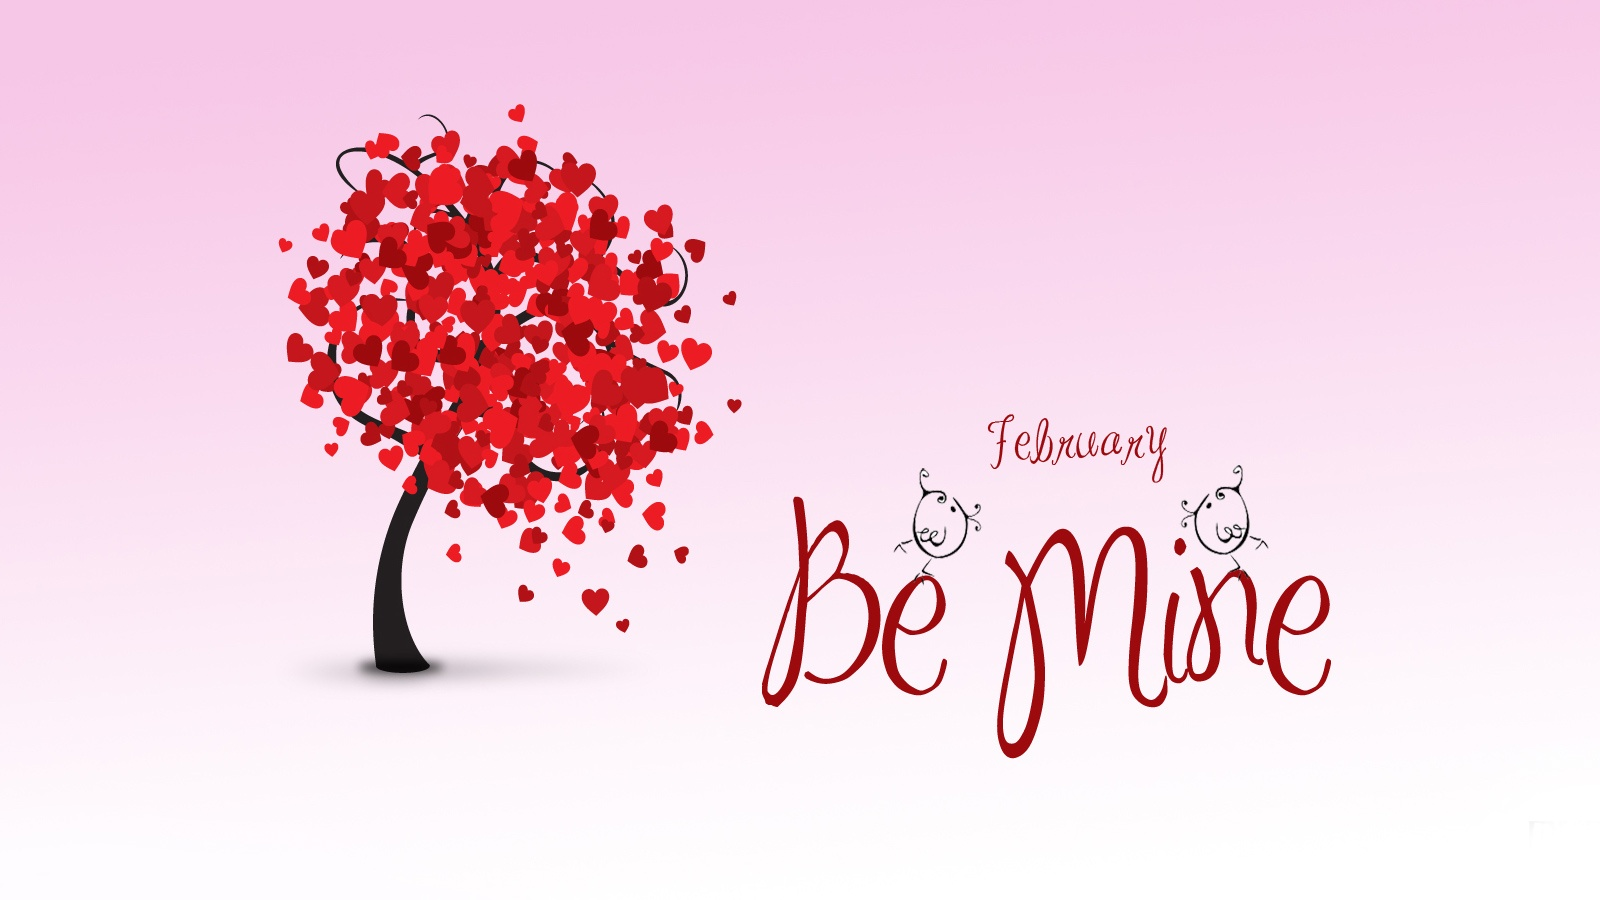 microsoft valentine u0026 39 s day wallpaper